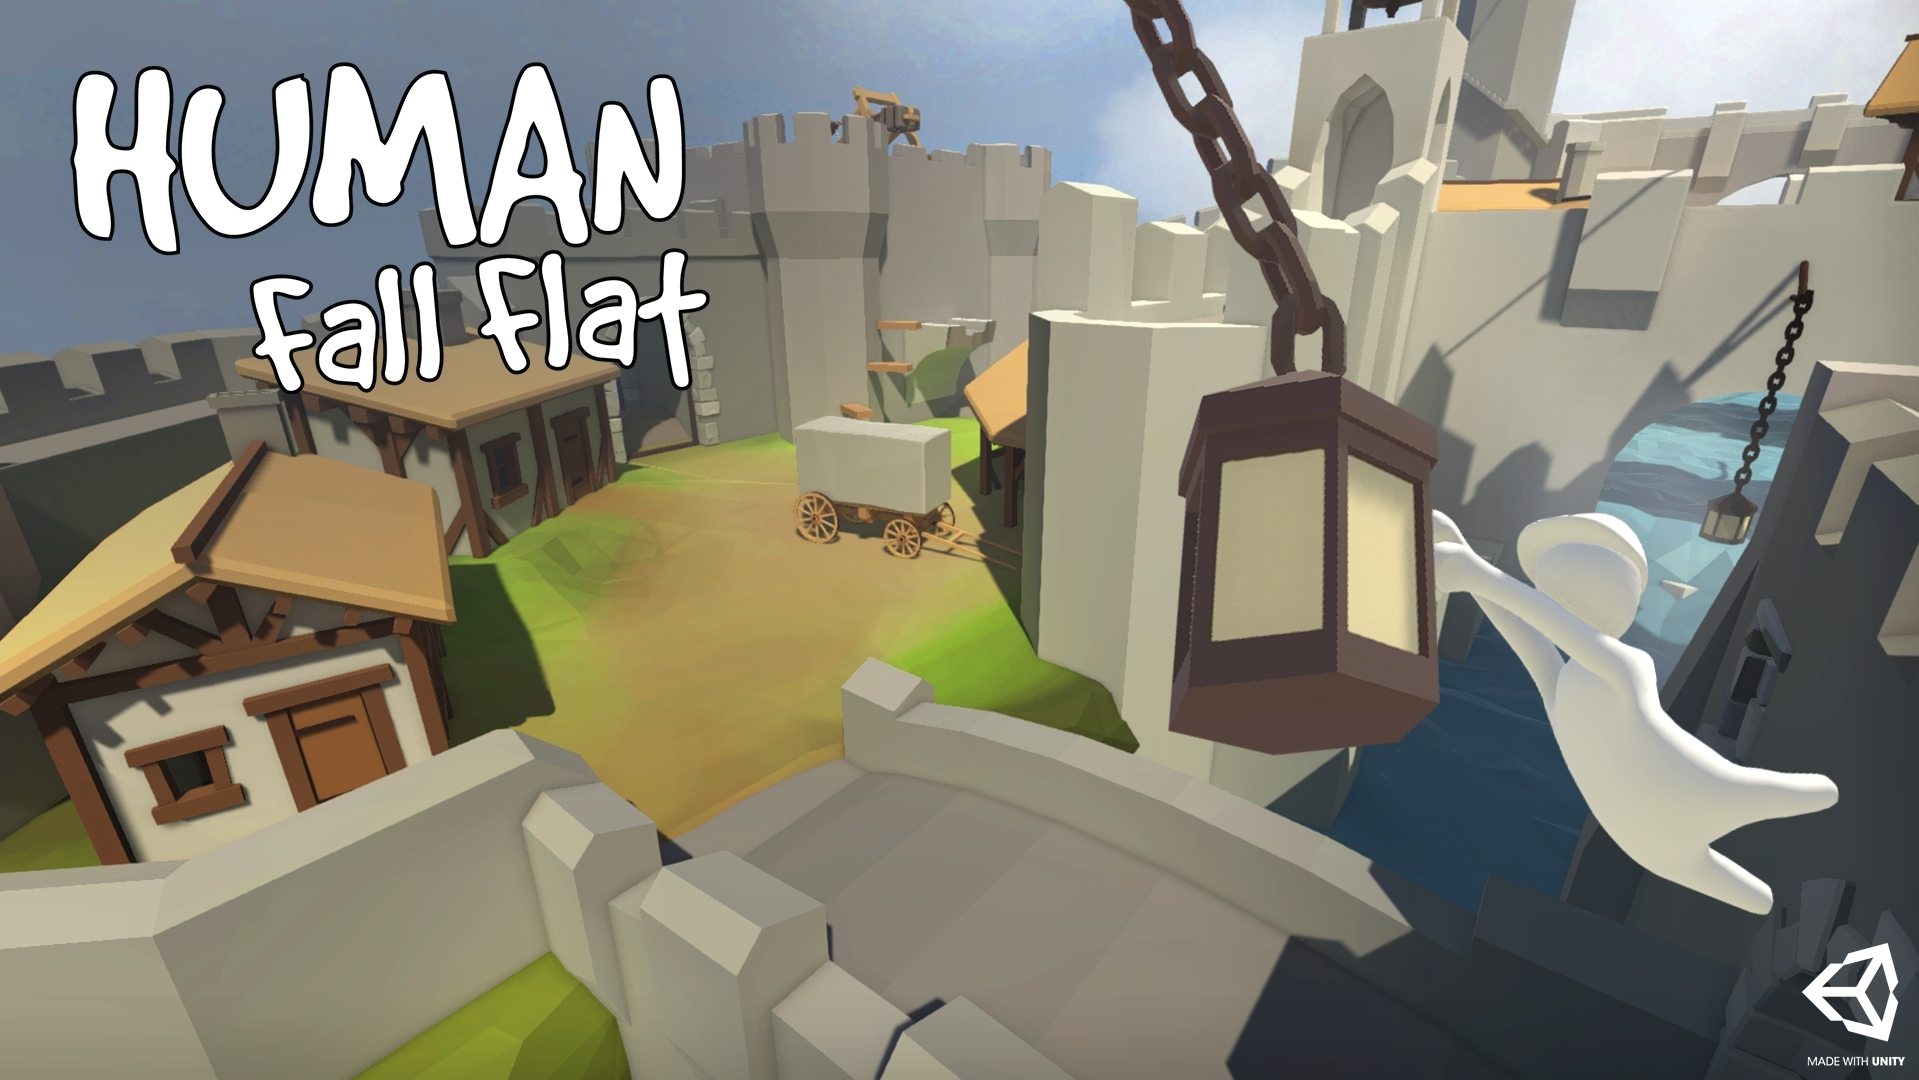 Human: Fall Flat لعبة ألغاز مبنية على الفيزياء متاحة الآن على أندرويد - عالم التقنية